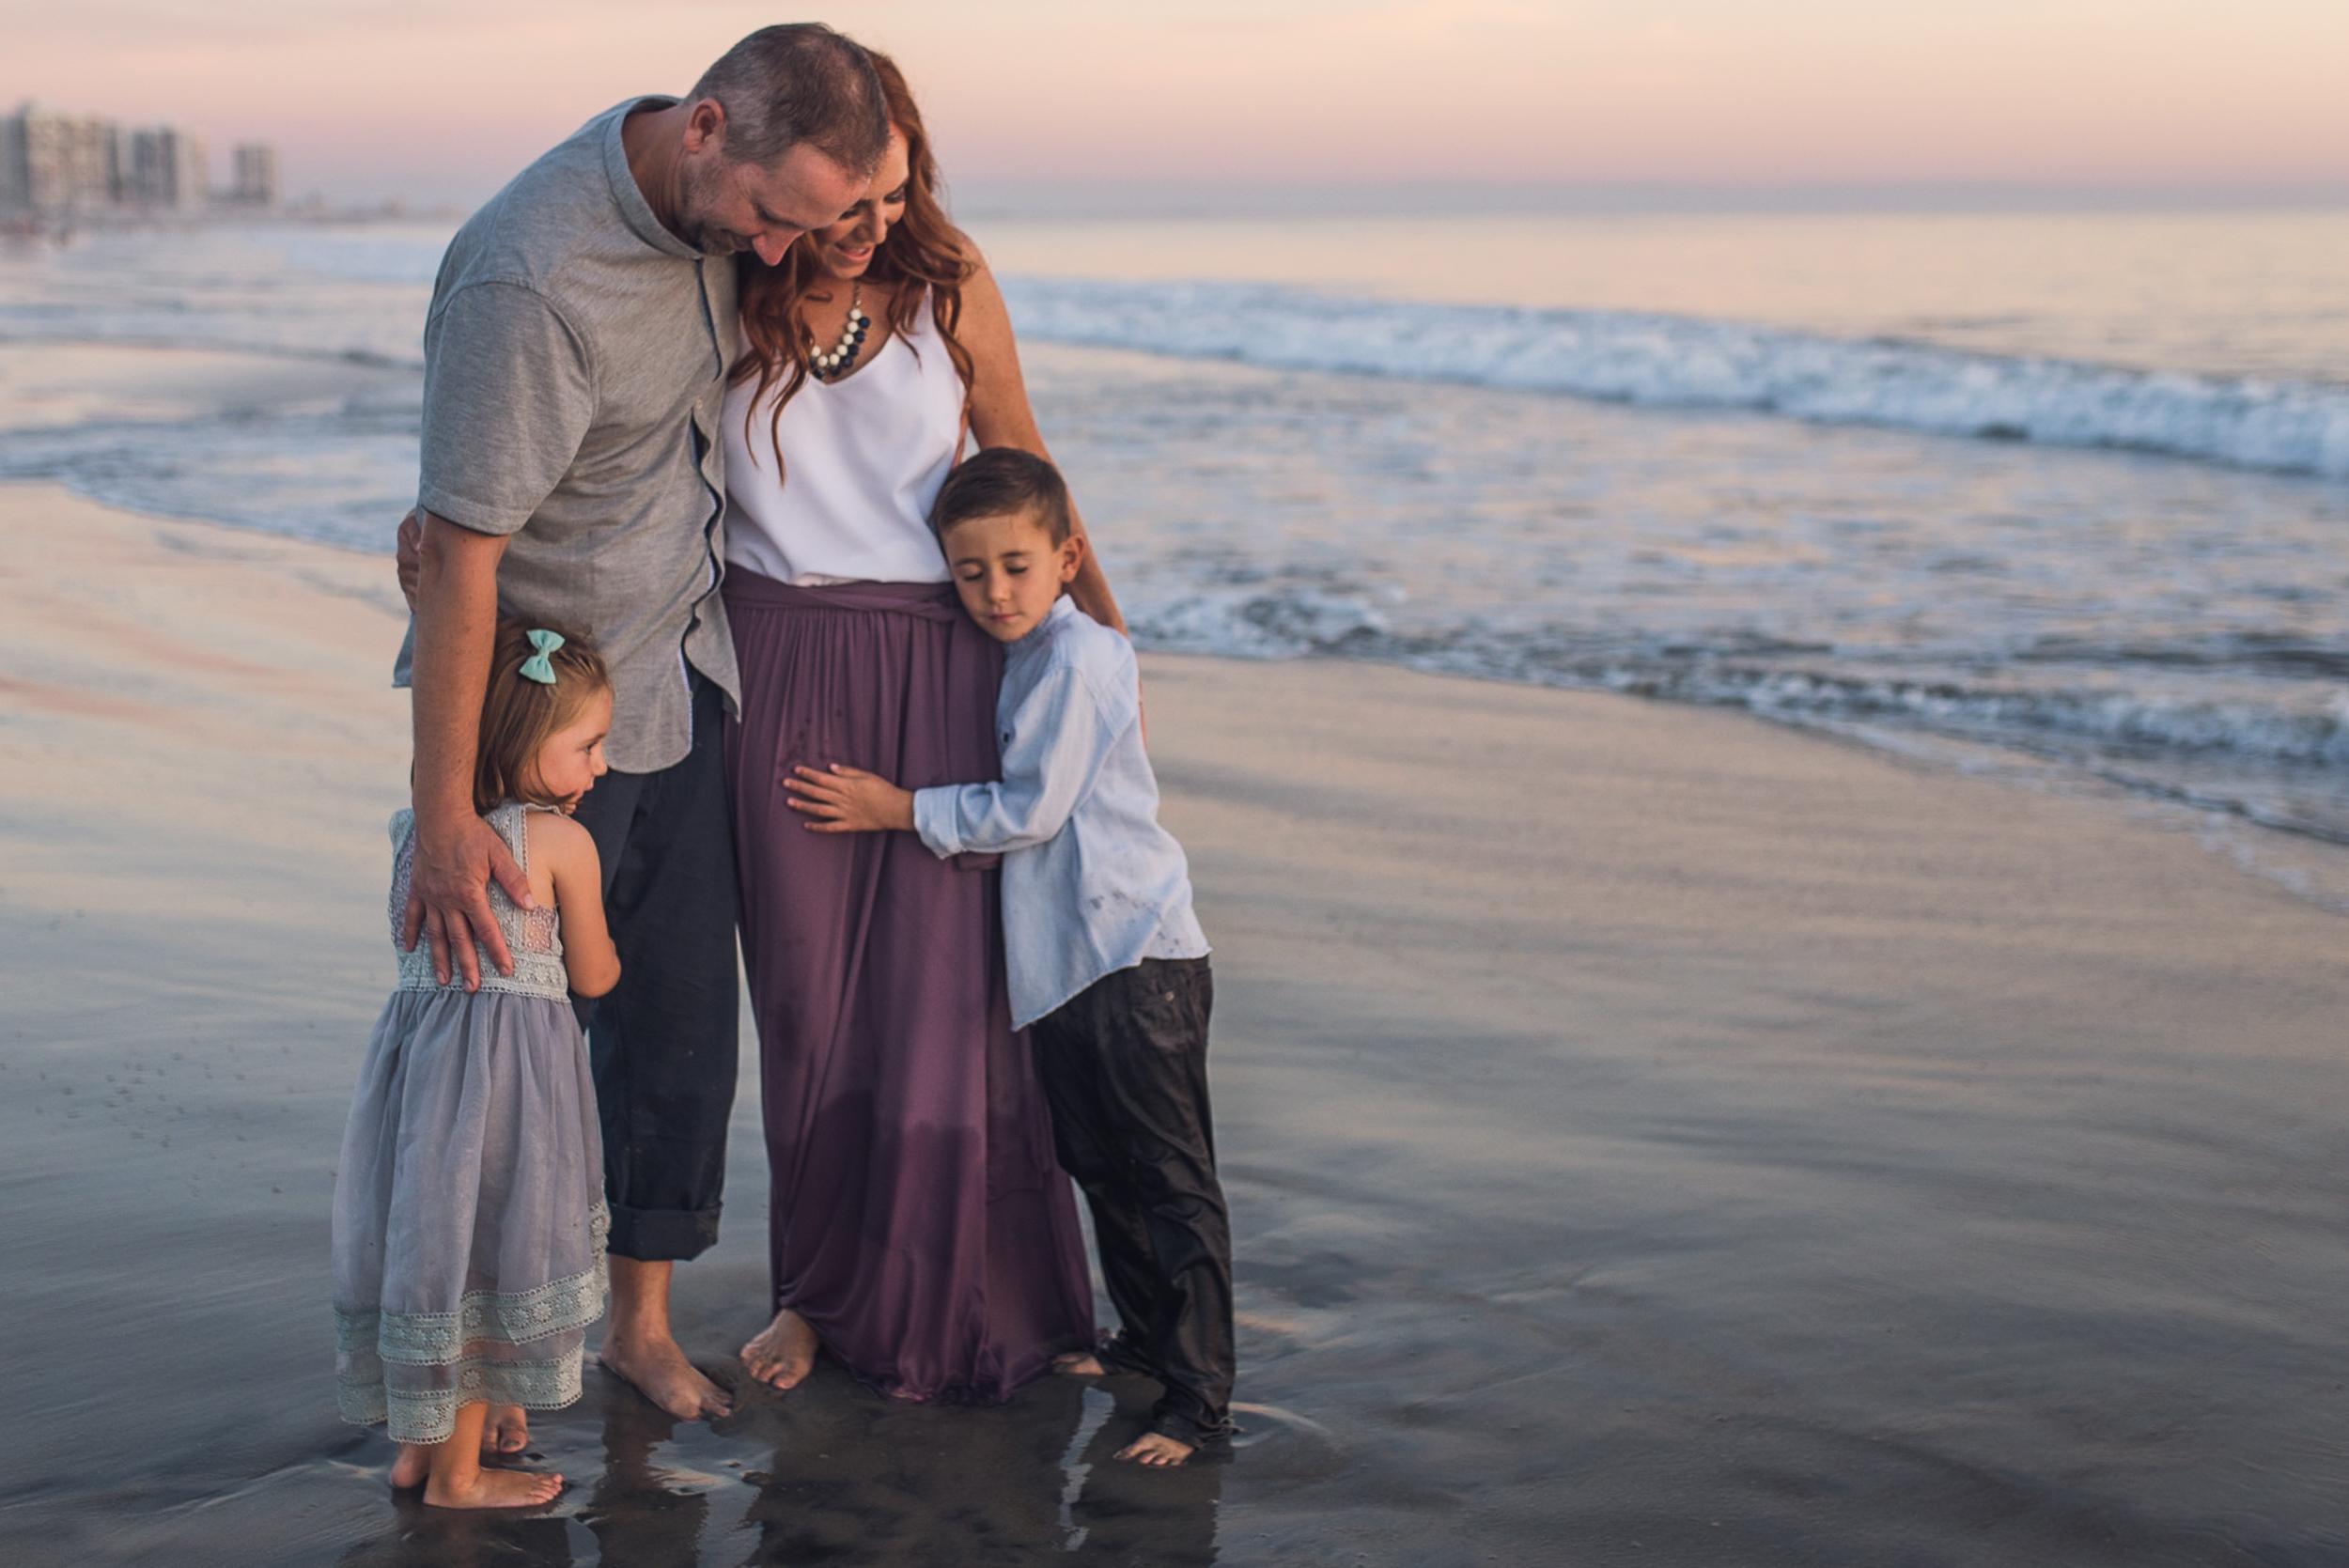 2018-San-Diego-Family-Lifestyle-Newborn-Travel-Vacation-Photographer-Kelsey-Smith-Photography-Coronado-La-Jolla-Encinitas-Solana-Beach-Del-Mar-197.jpg